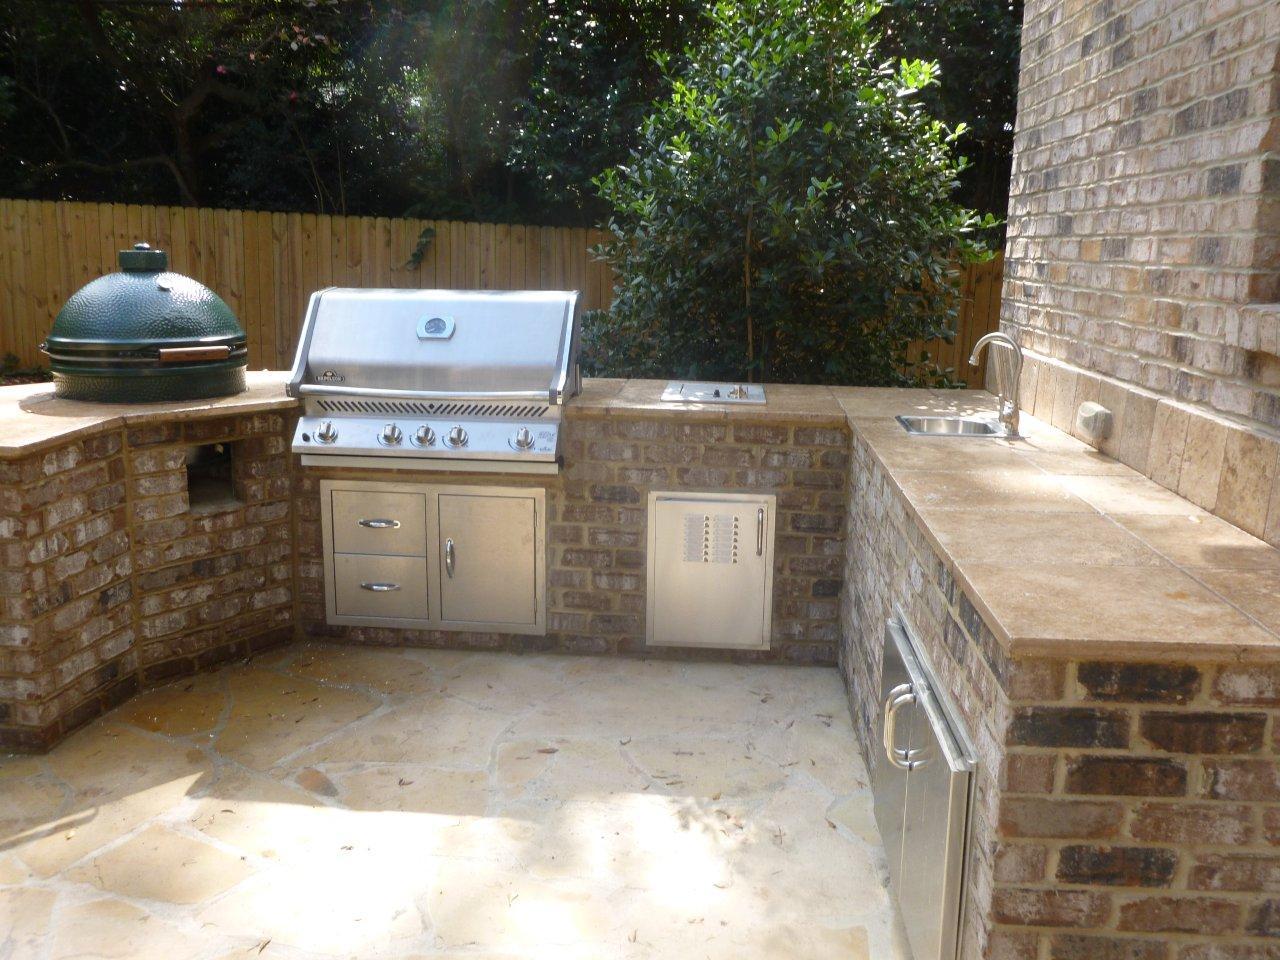 Outdoor Tile Countertops Grill Travertine Counter Outdoor